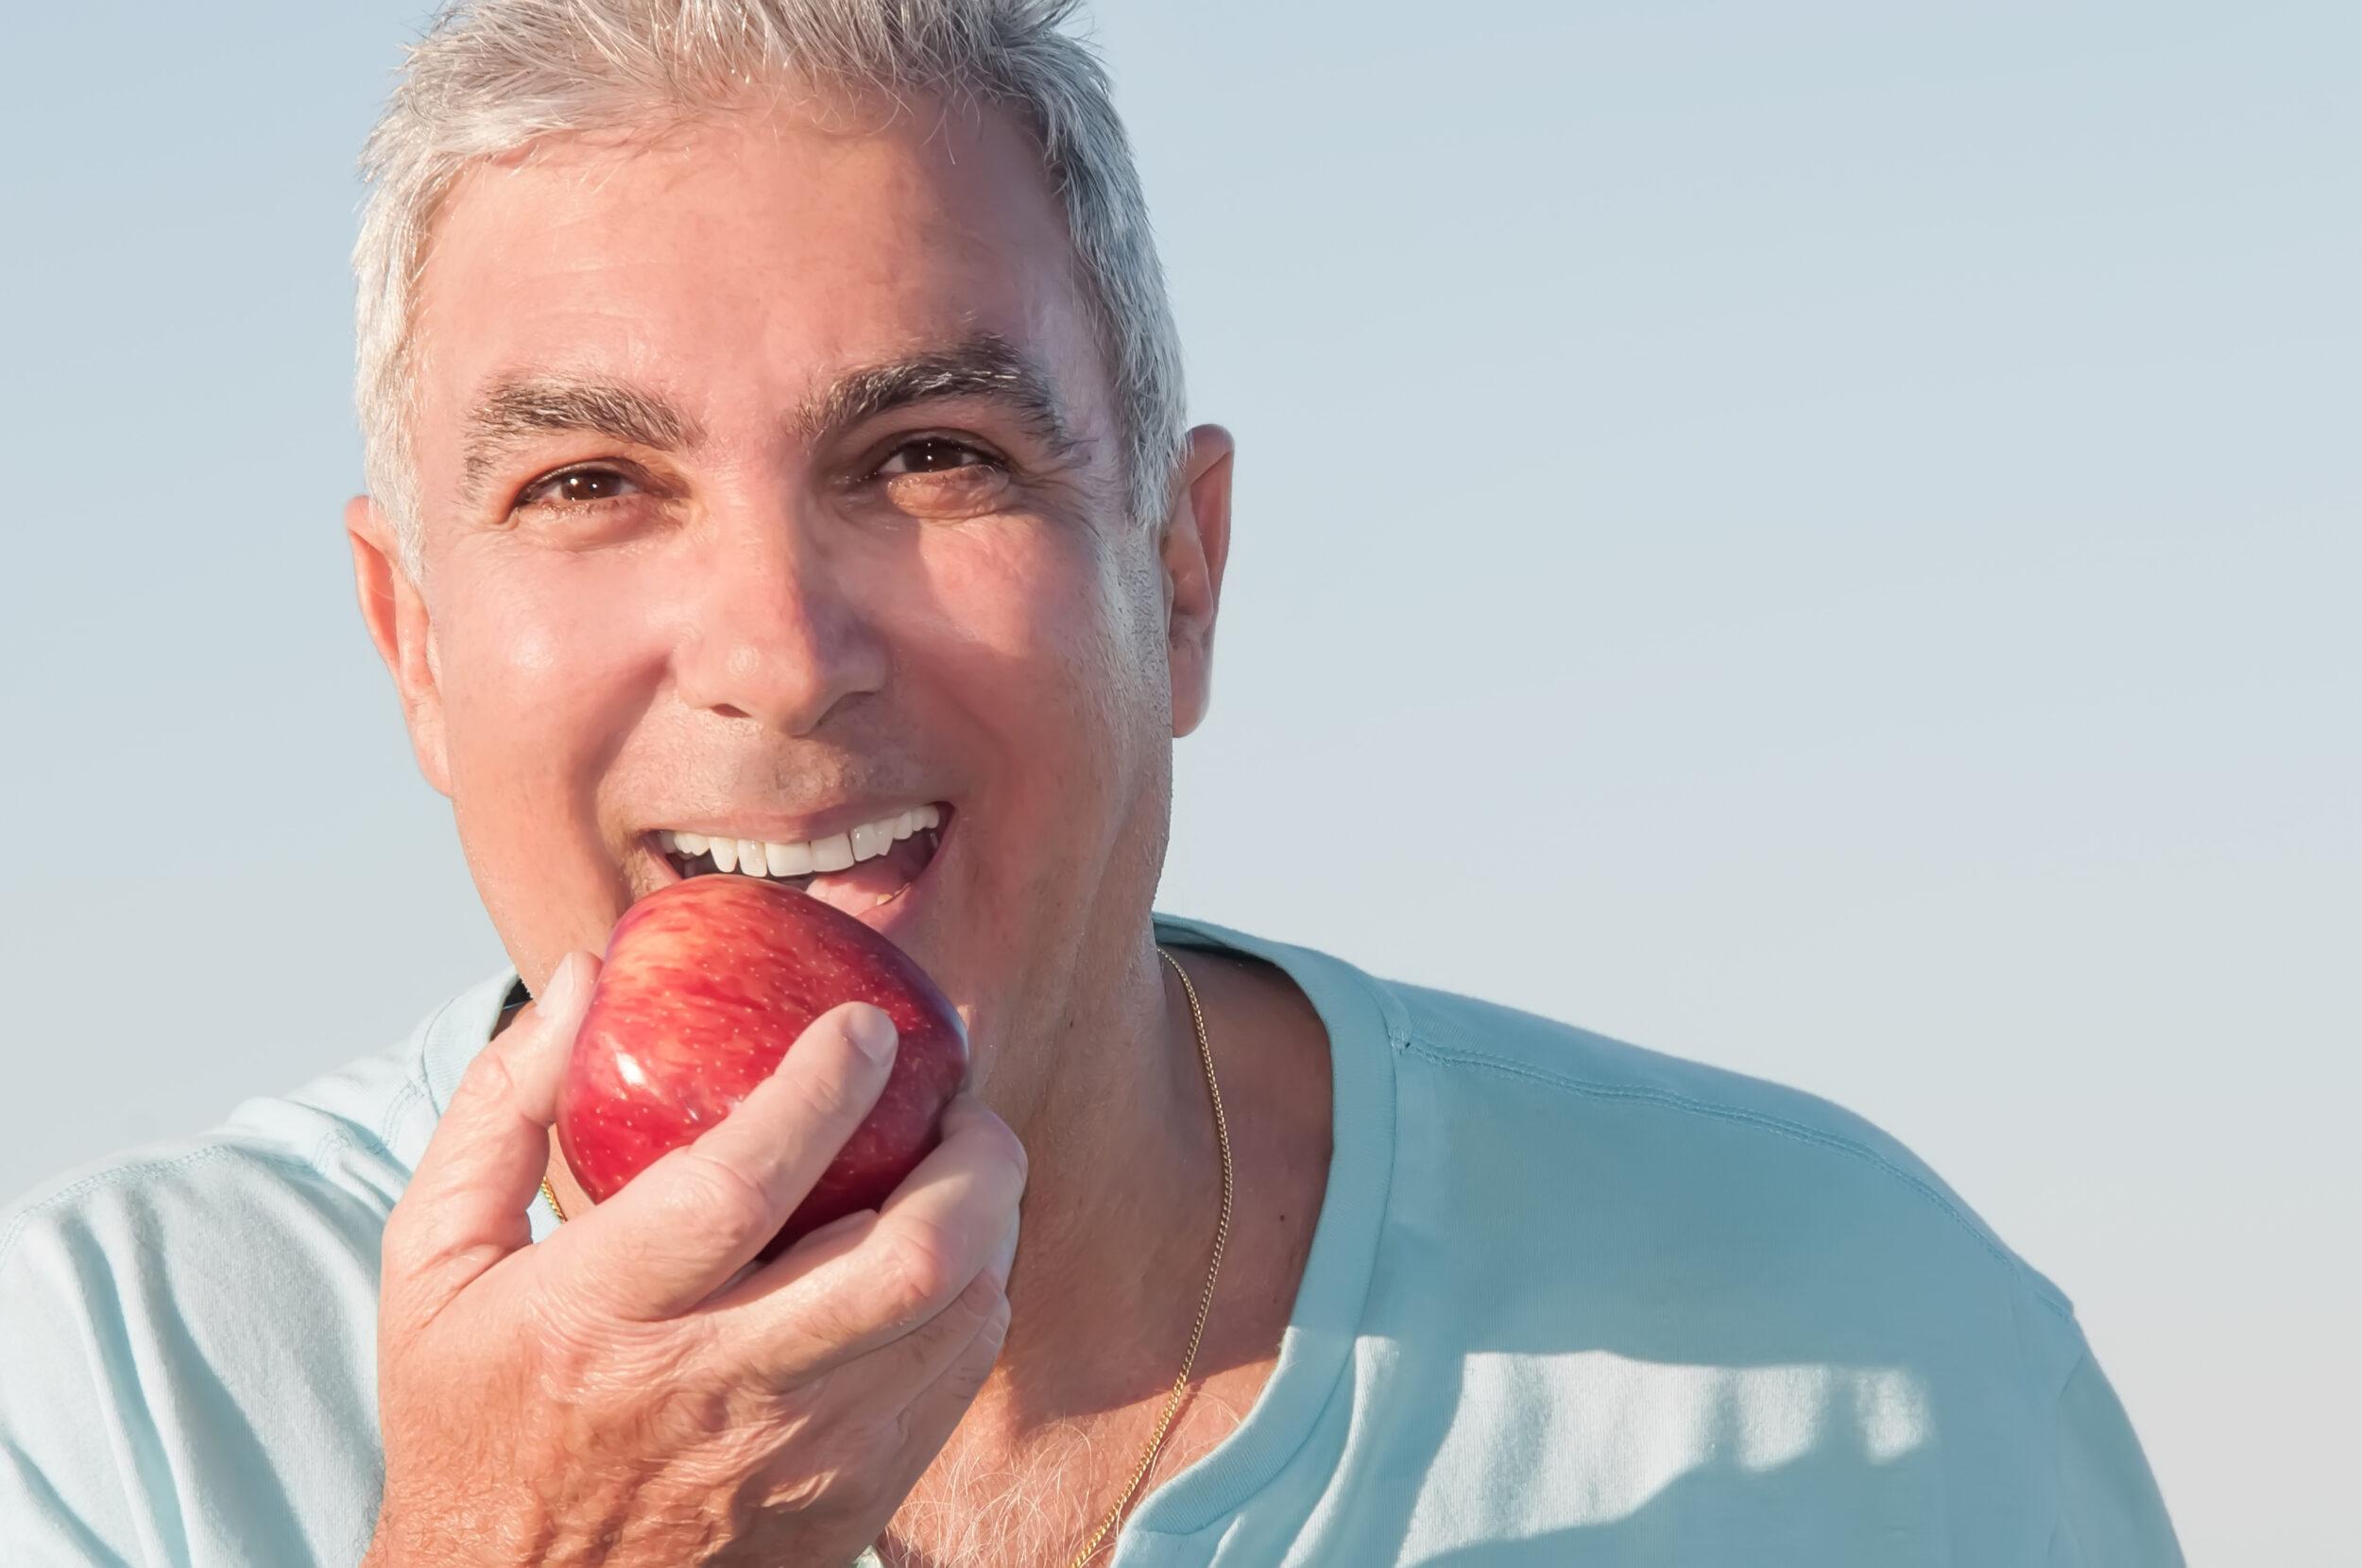 Happy Man Biting Apple